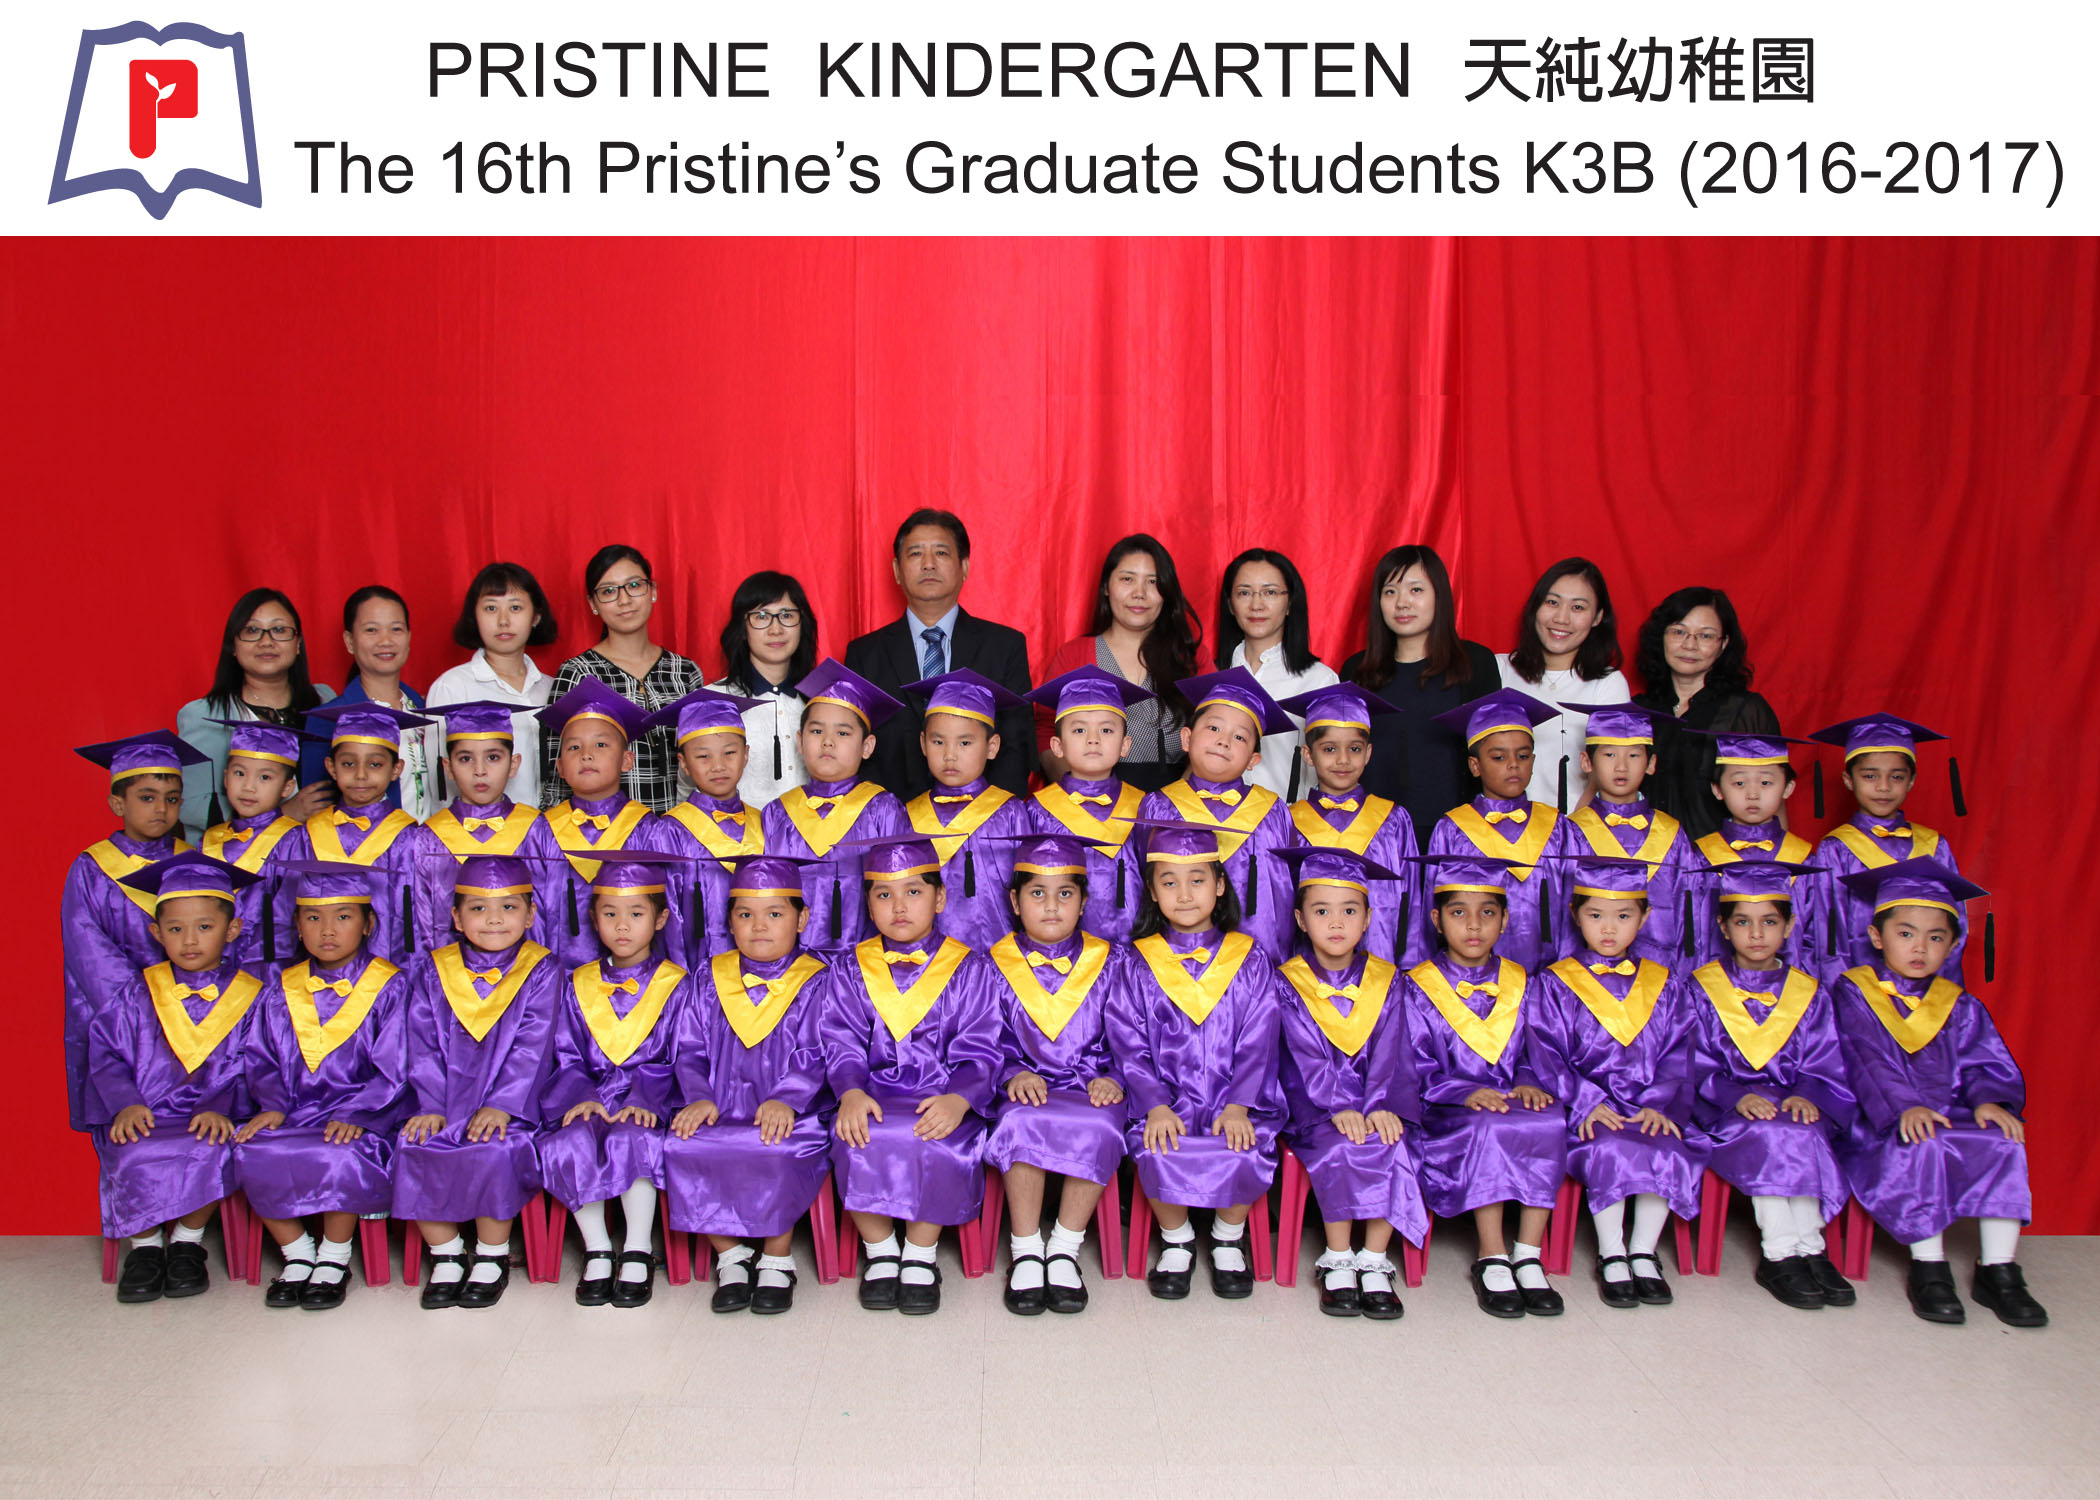 16-17 K3B Class Photo